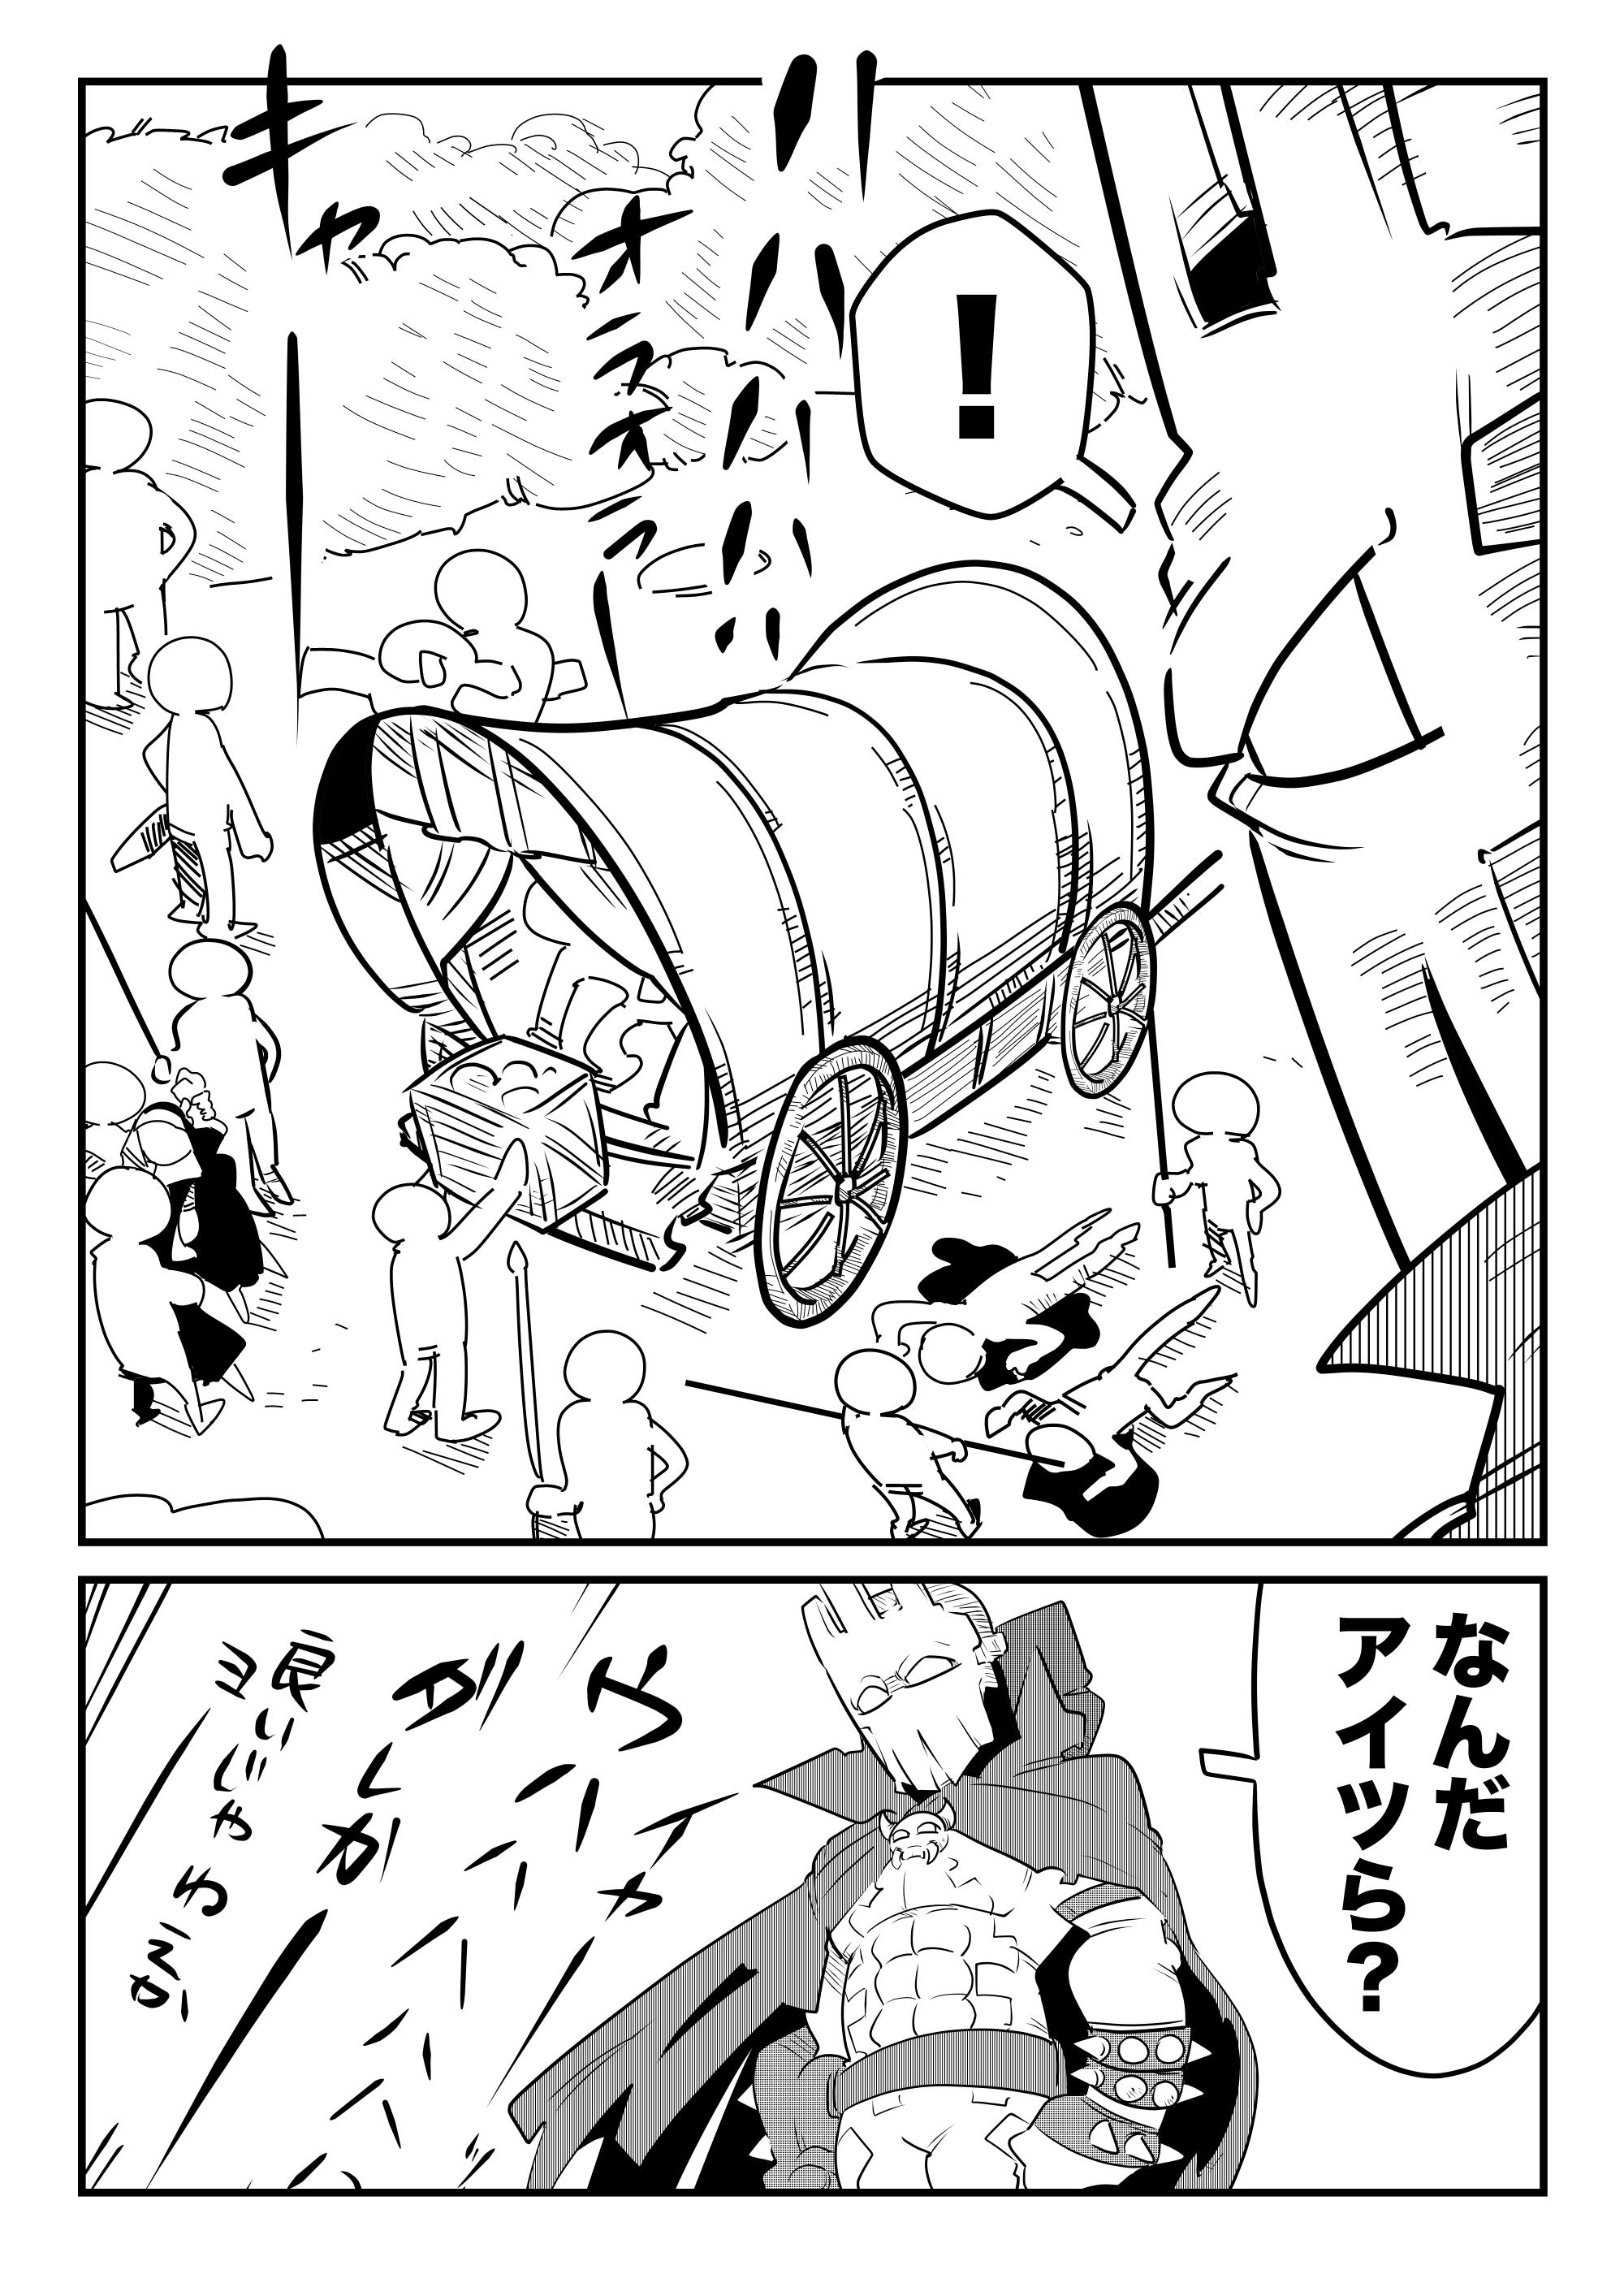 f:id:terashimaru117:20210914183030p:plain